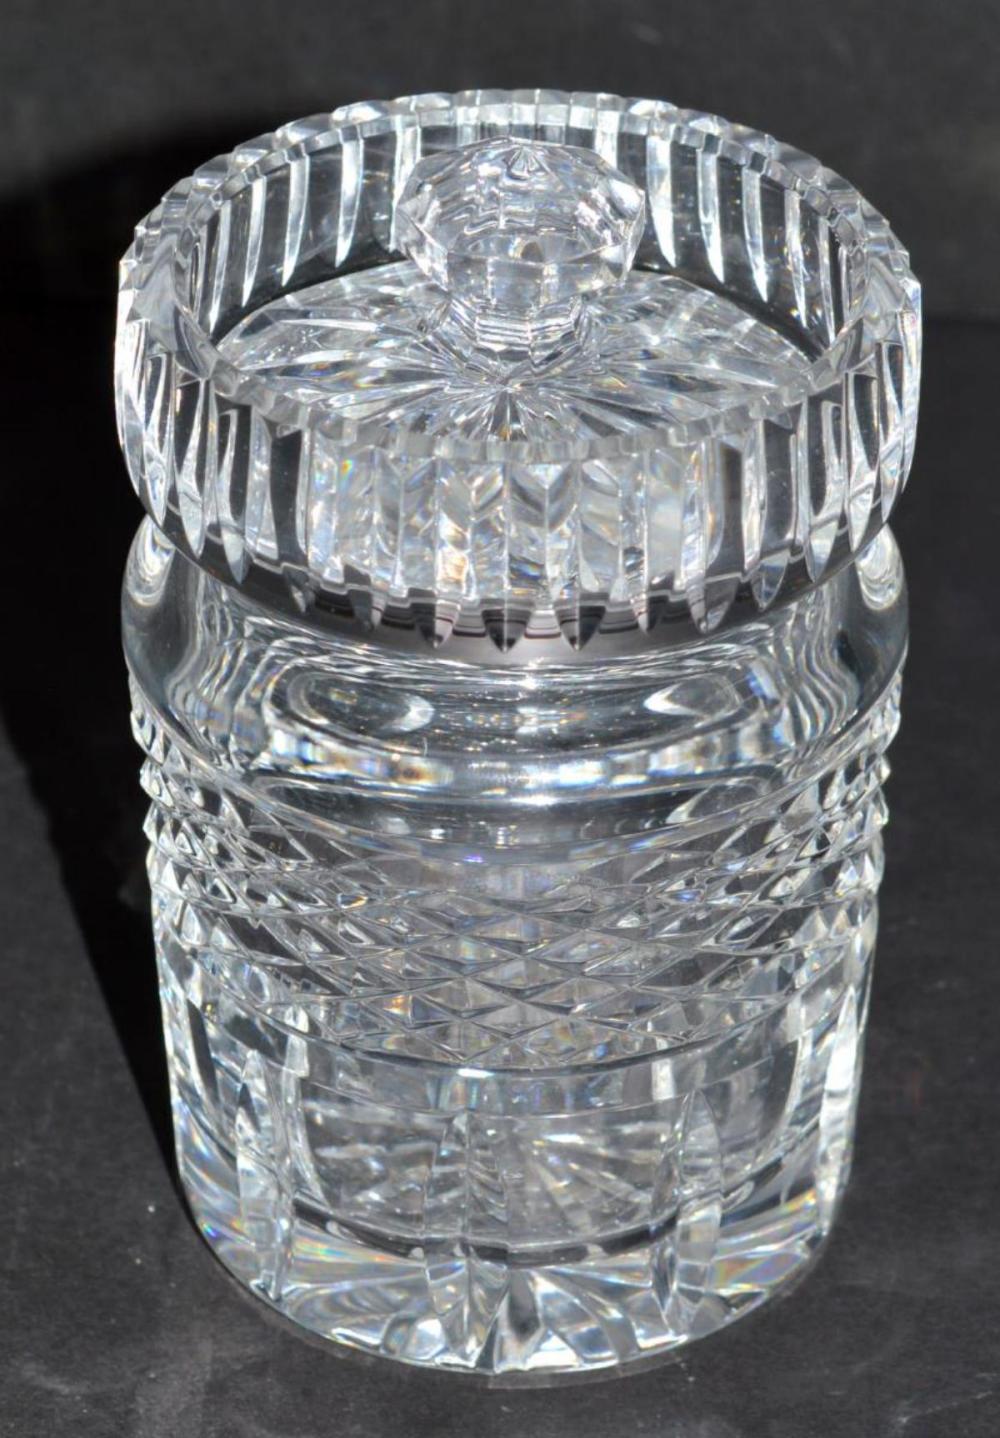 Waterford Jelly Jam Honey Lidded Cut Crystal Jar